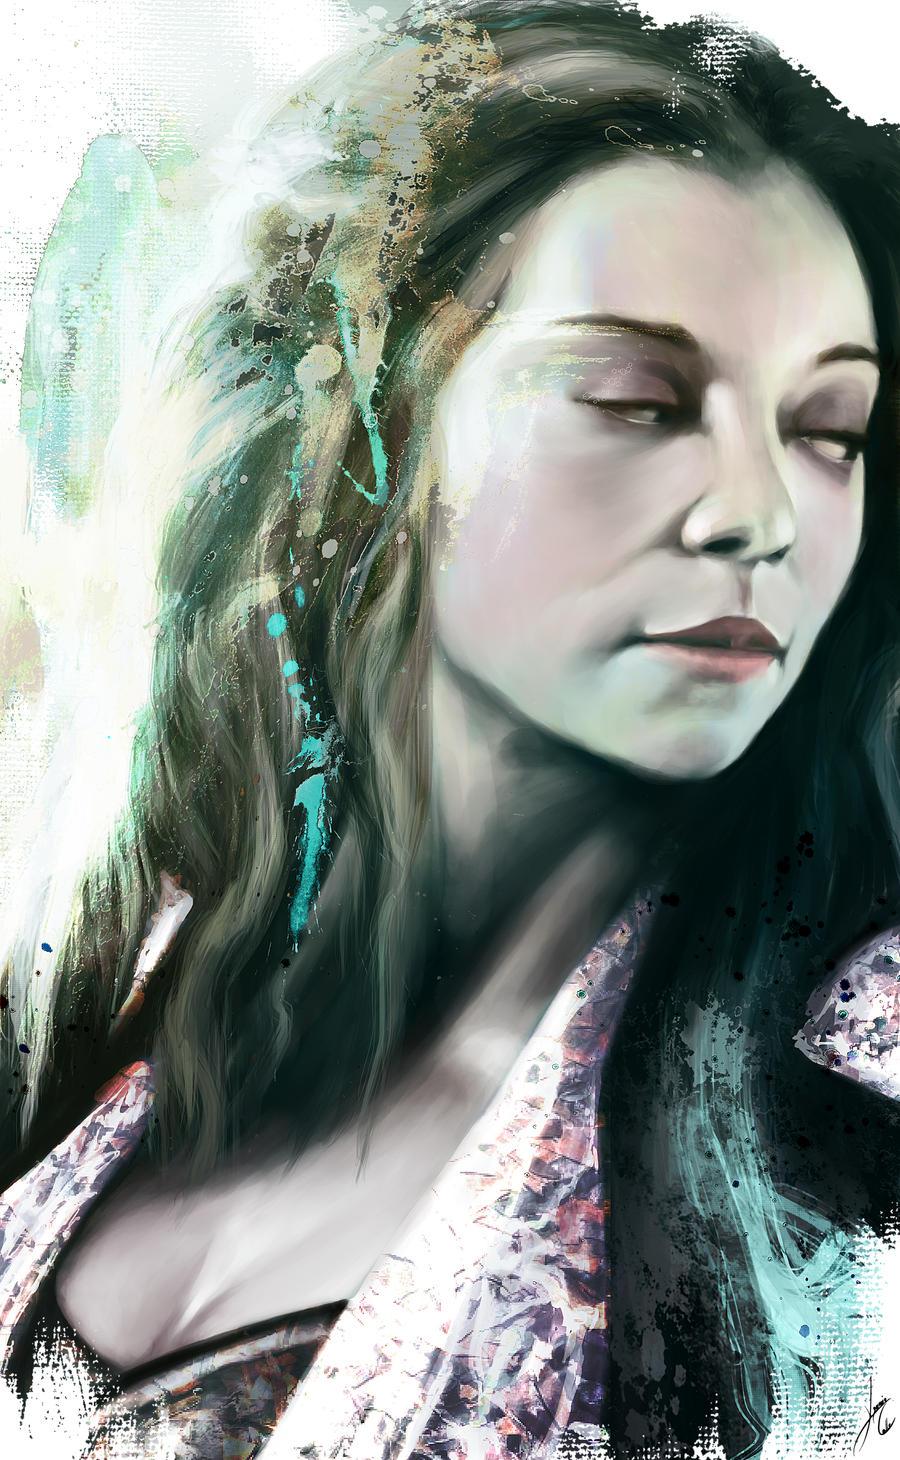 Margaery Tyrell by ignacio197